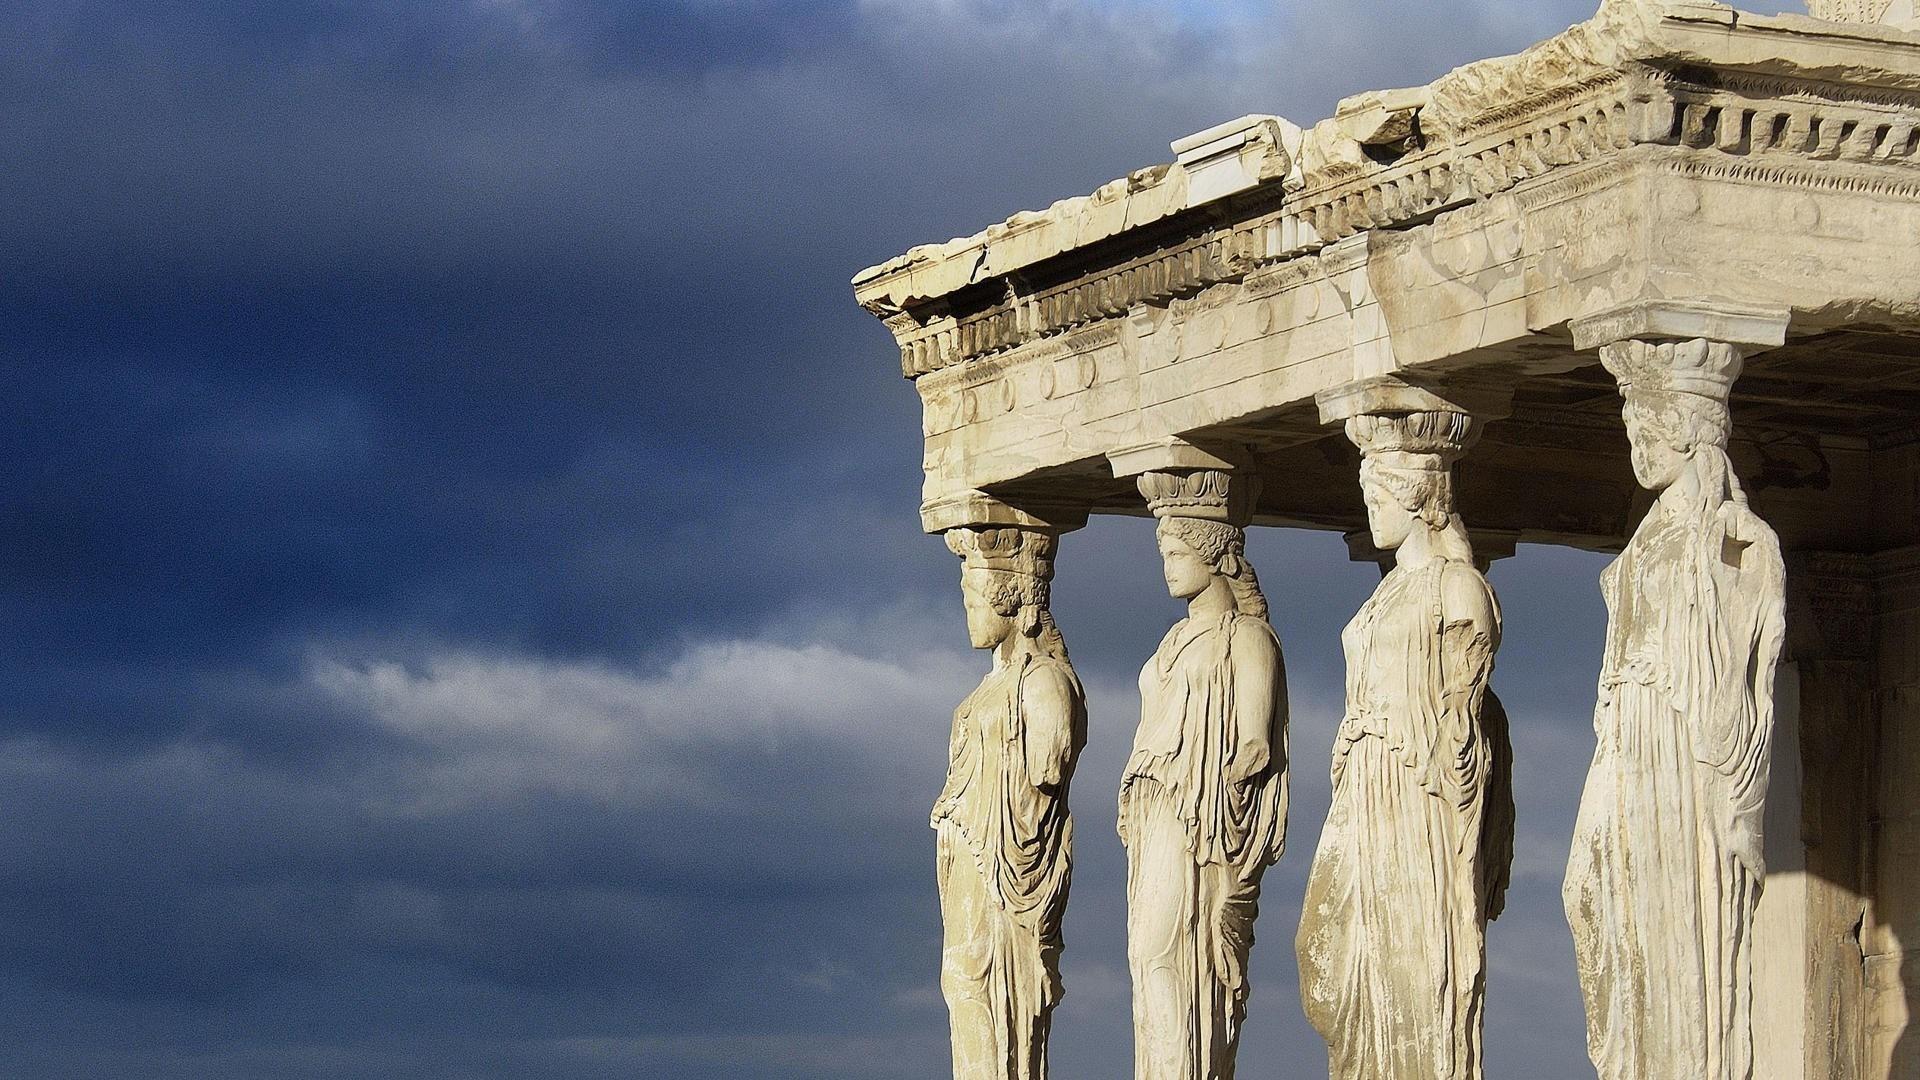 Ancient greece wallpaper 62 images - Ancient greece wallpaper hd ...